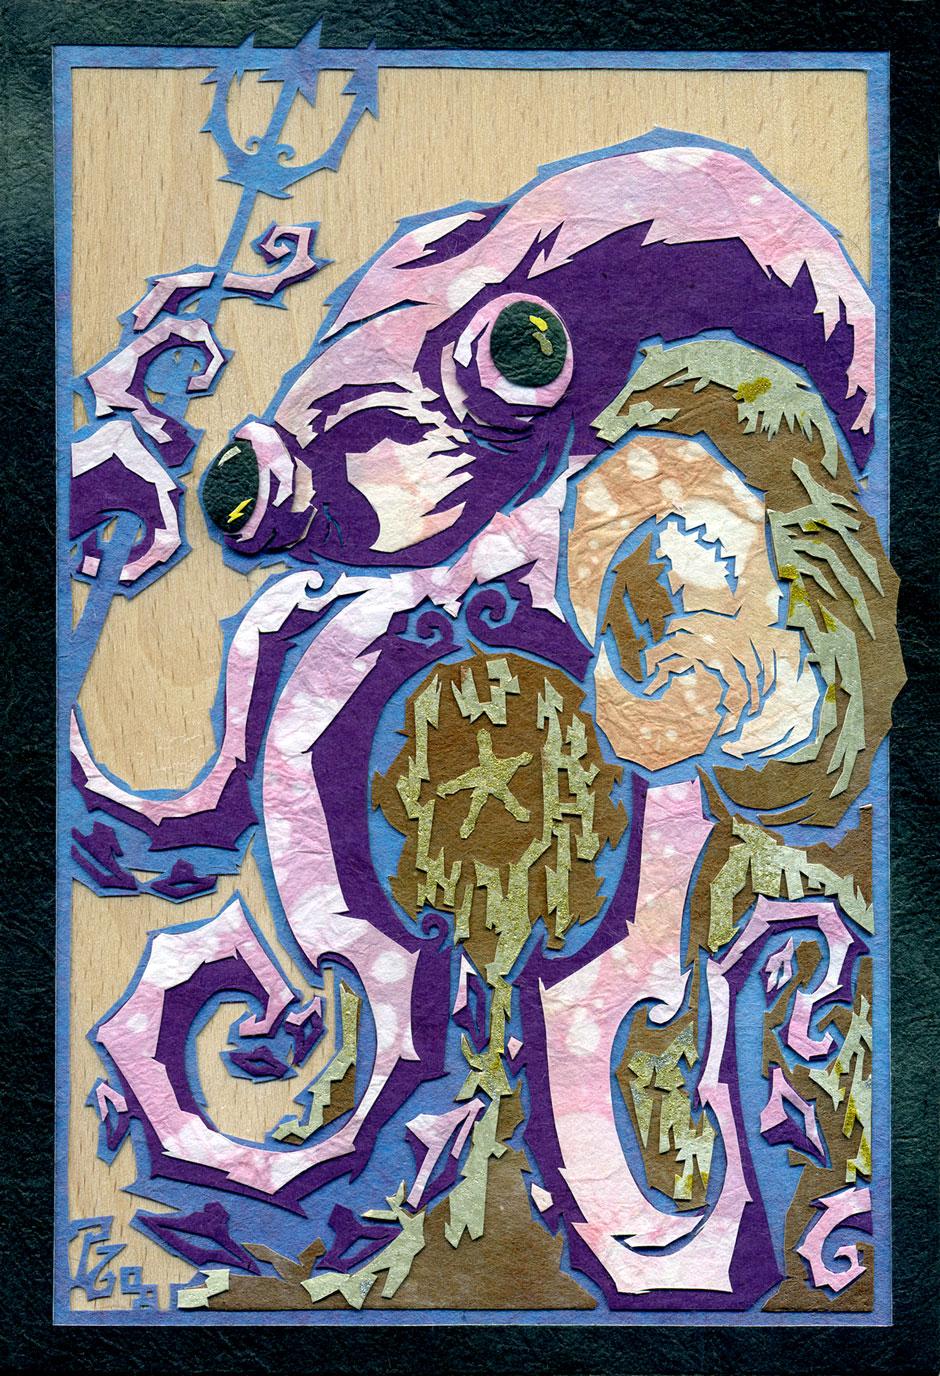 Flailing Purple Tentacles of Beastie Destruction!